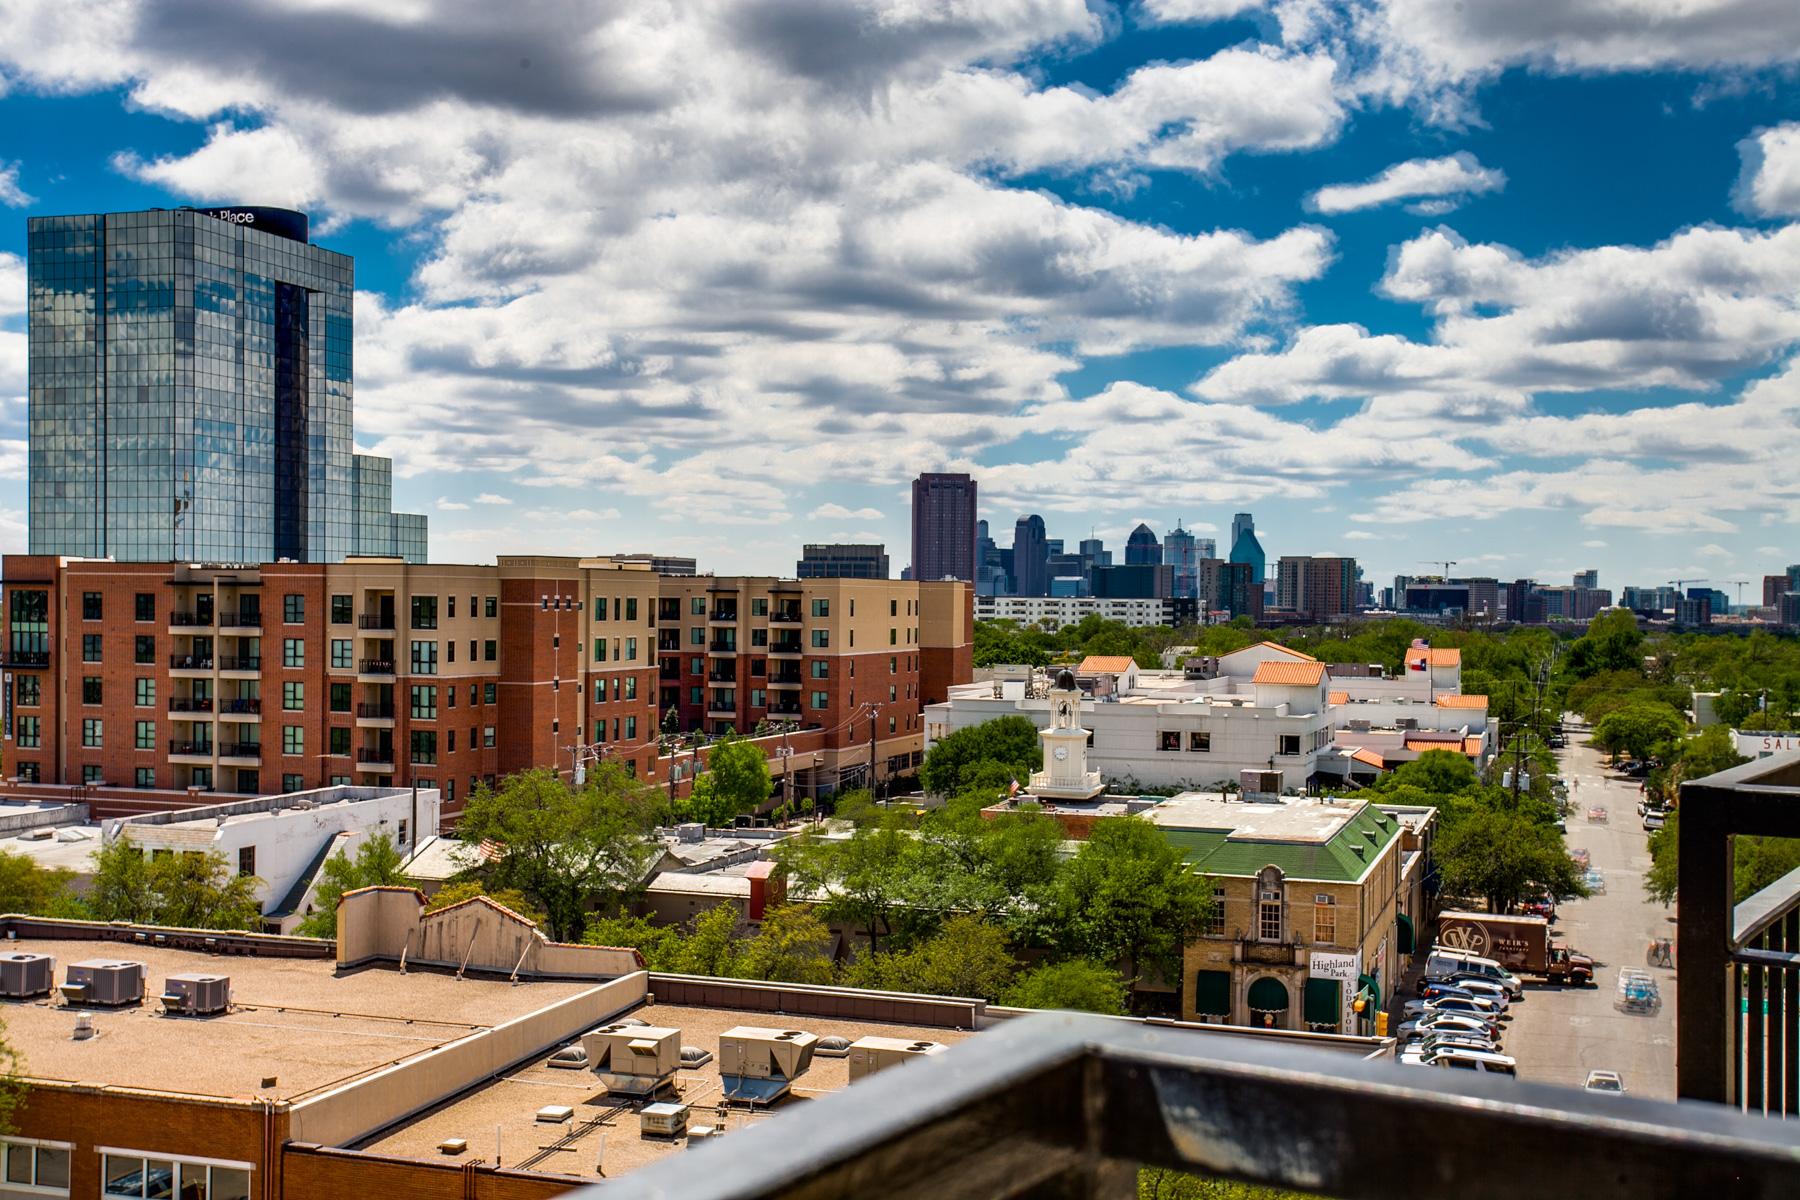 Condominiums للـ Sale في Beautiful High-Rise Condo Soaring Above Knox Street with Picturesque Views 4611 Travis Street #801B, Dallas, Texas 75205 United States